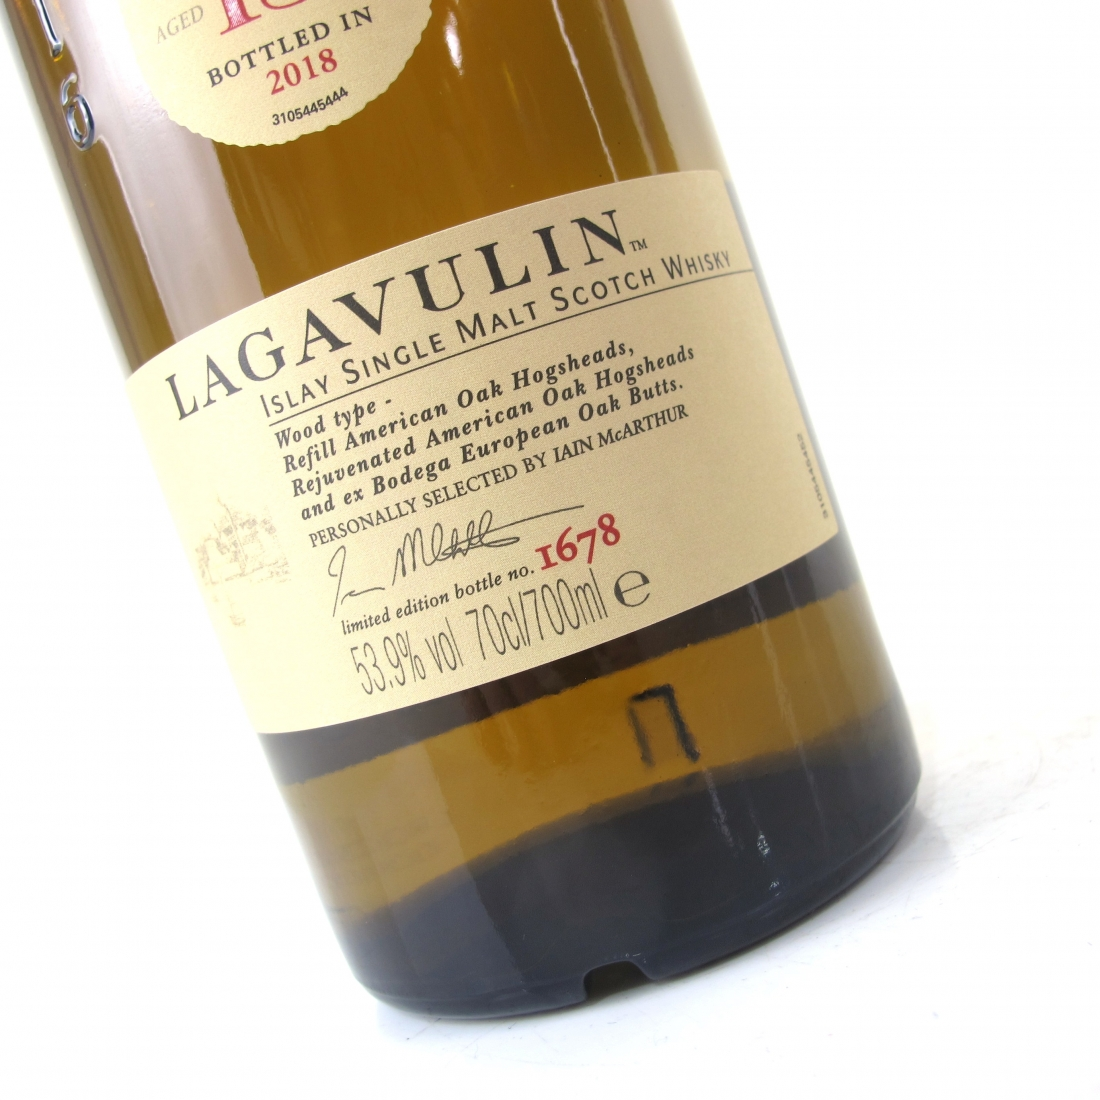 Lagavulin 18 Year Old Feis Ile 2018